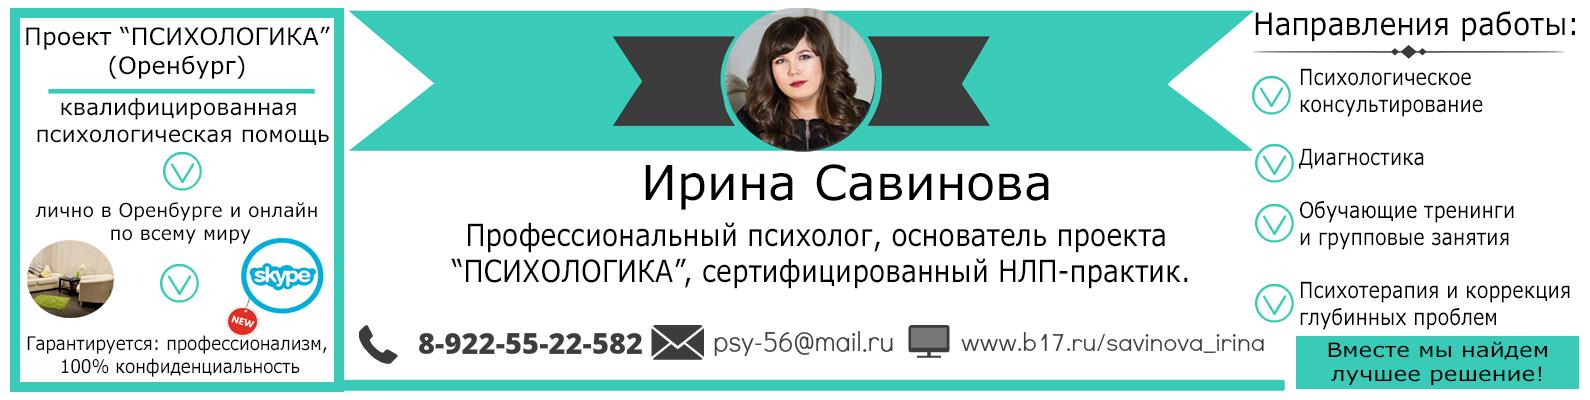 Консультация психотерапевта оренбург